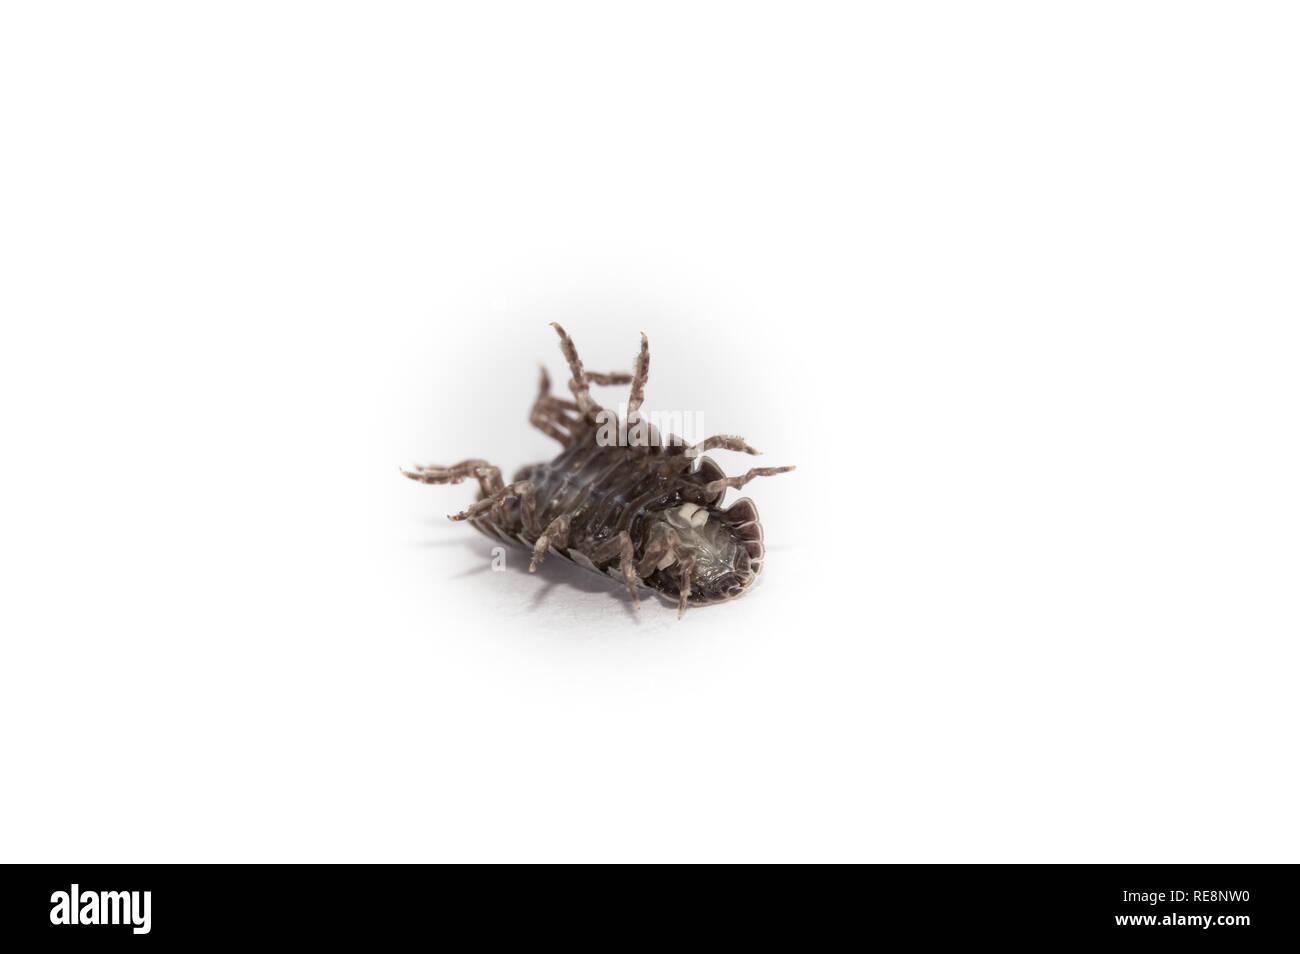 Struggling Pill Bug - Stock Image